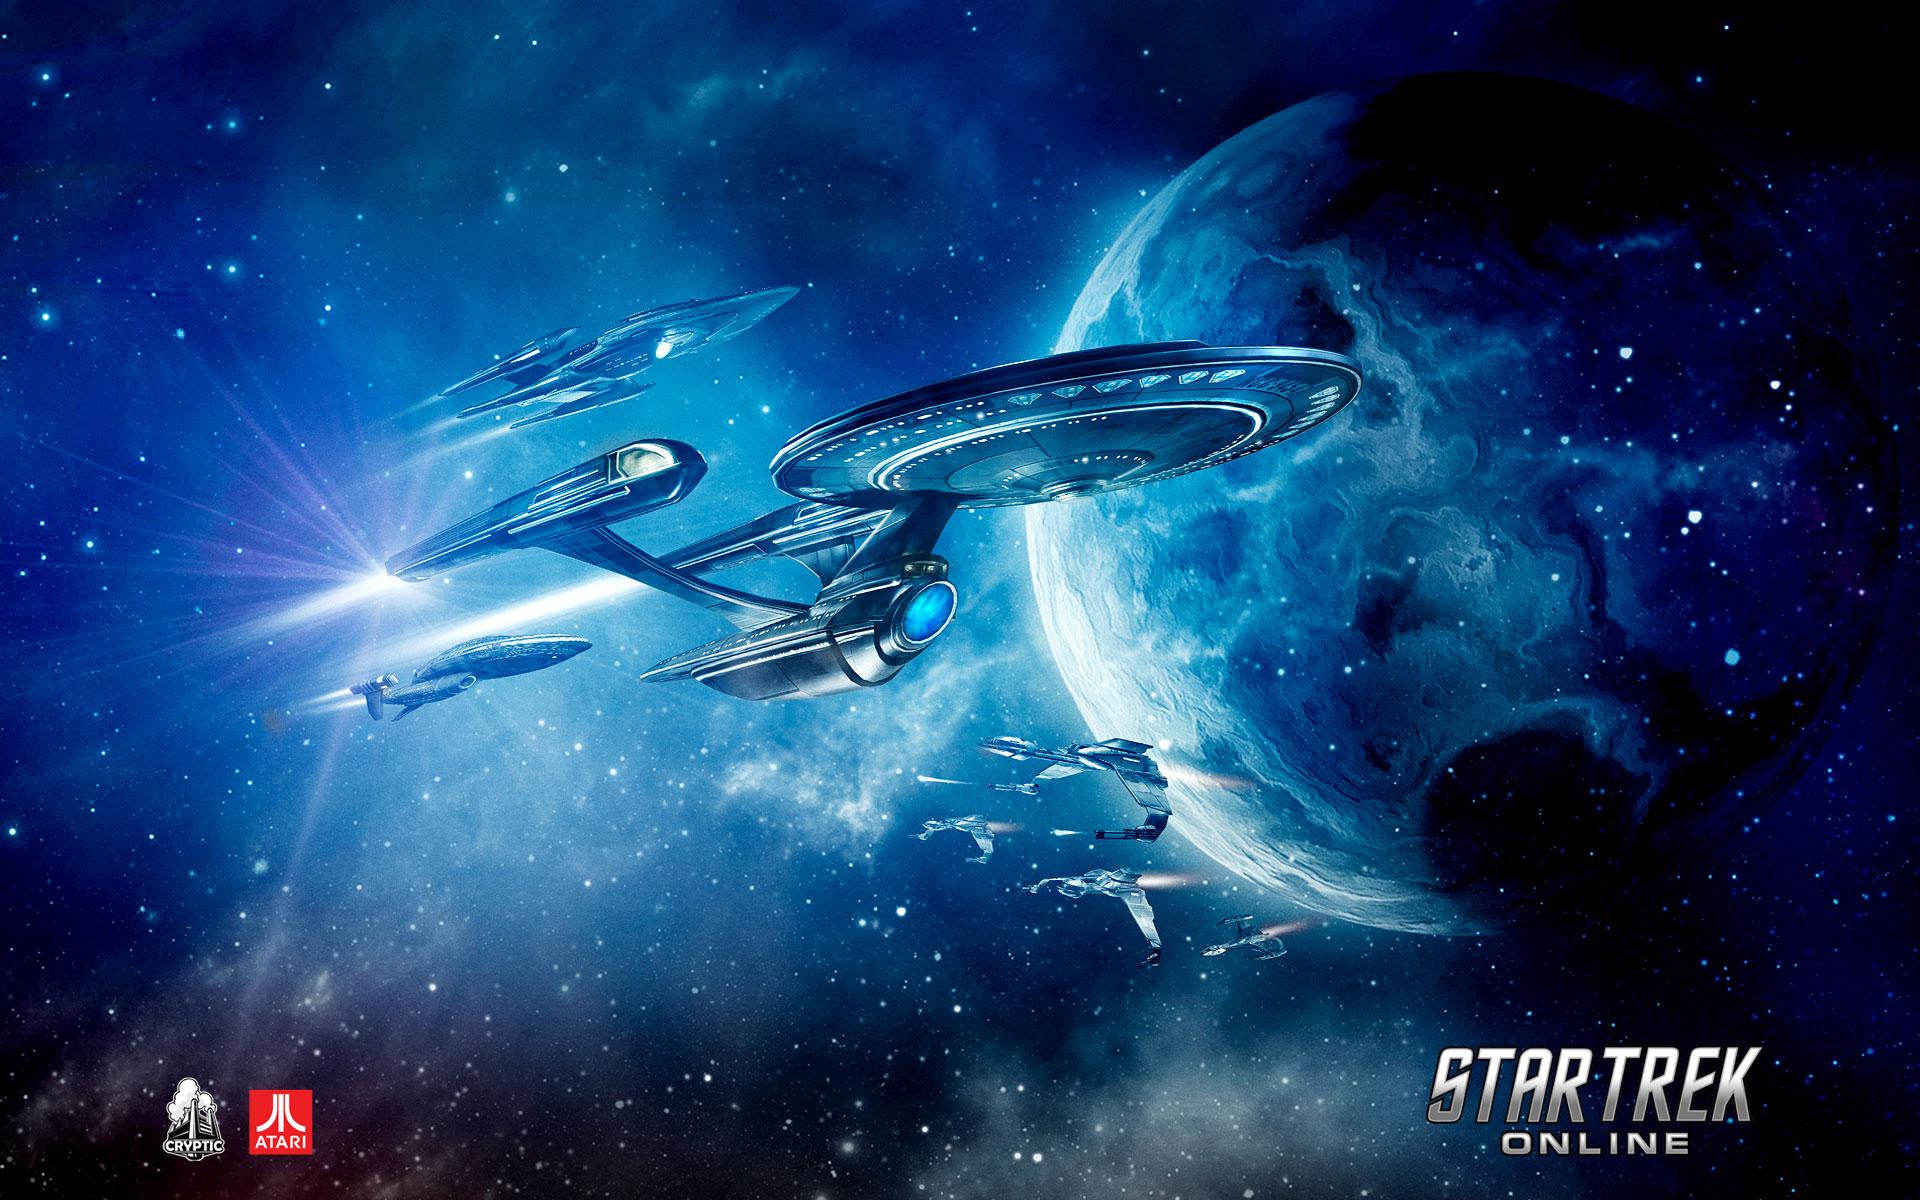 Star Trek Wallpaper 1920X1200 wallpaper   404066 1920x1200